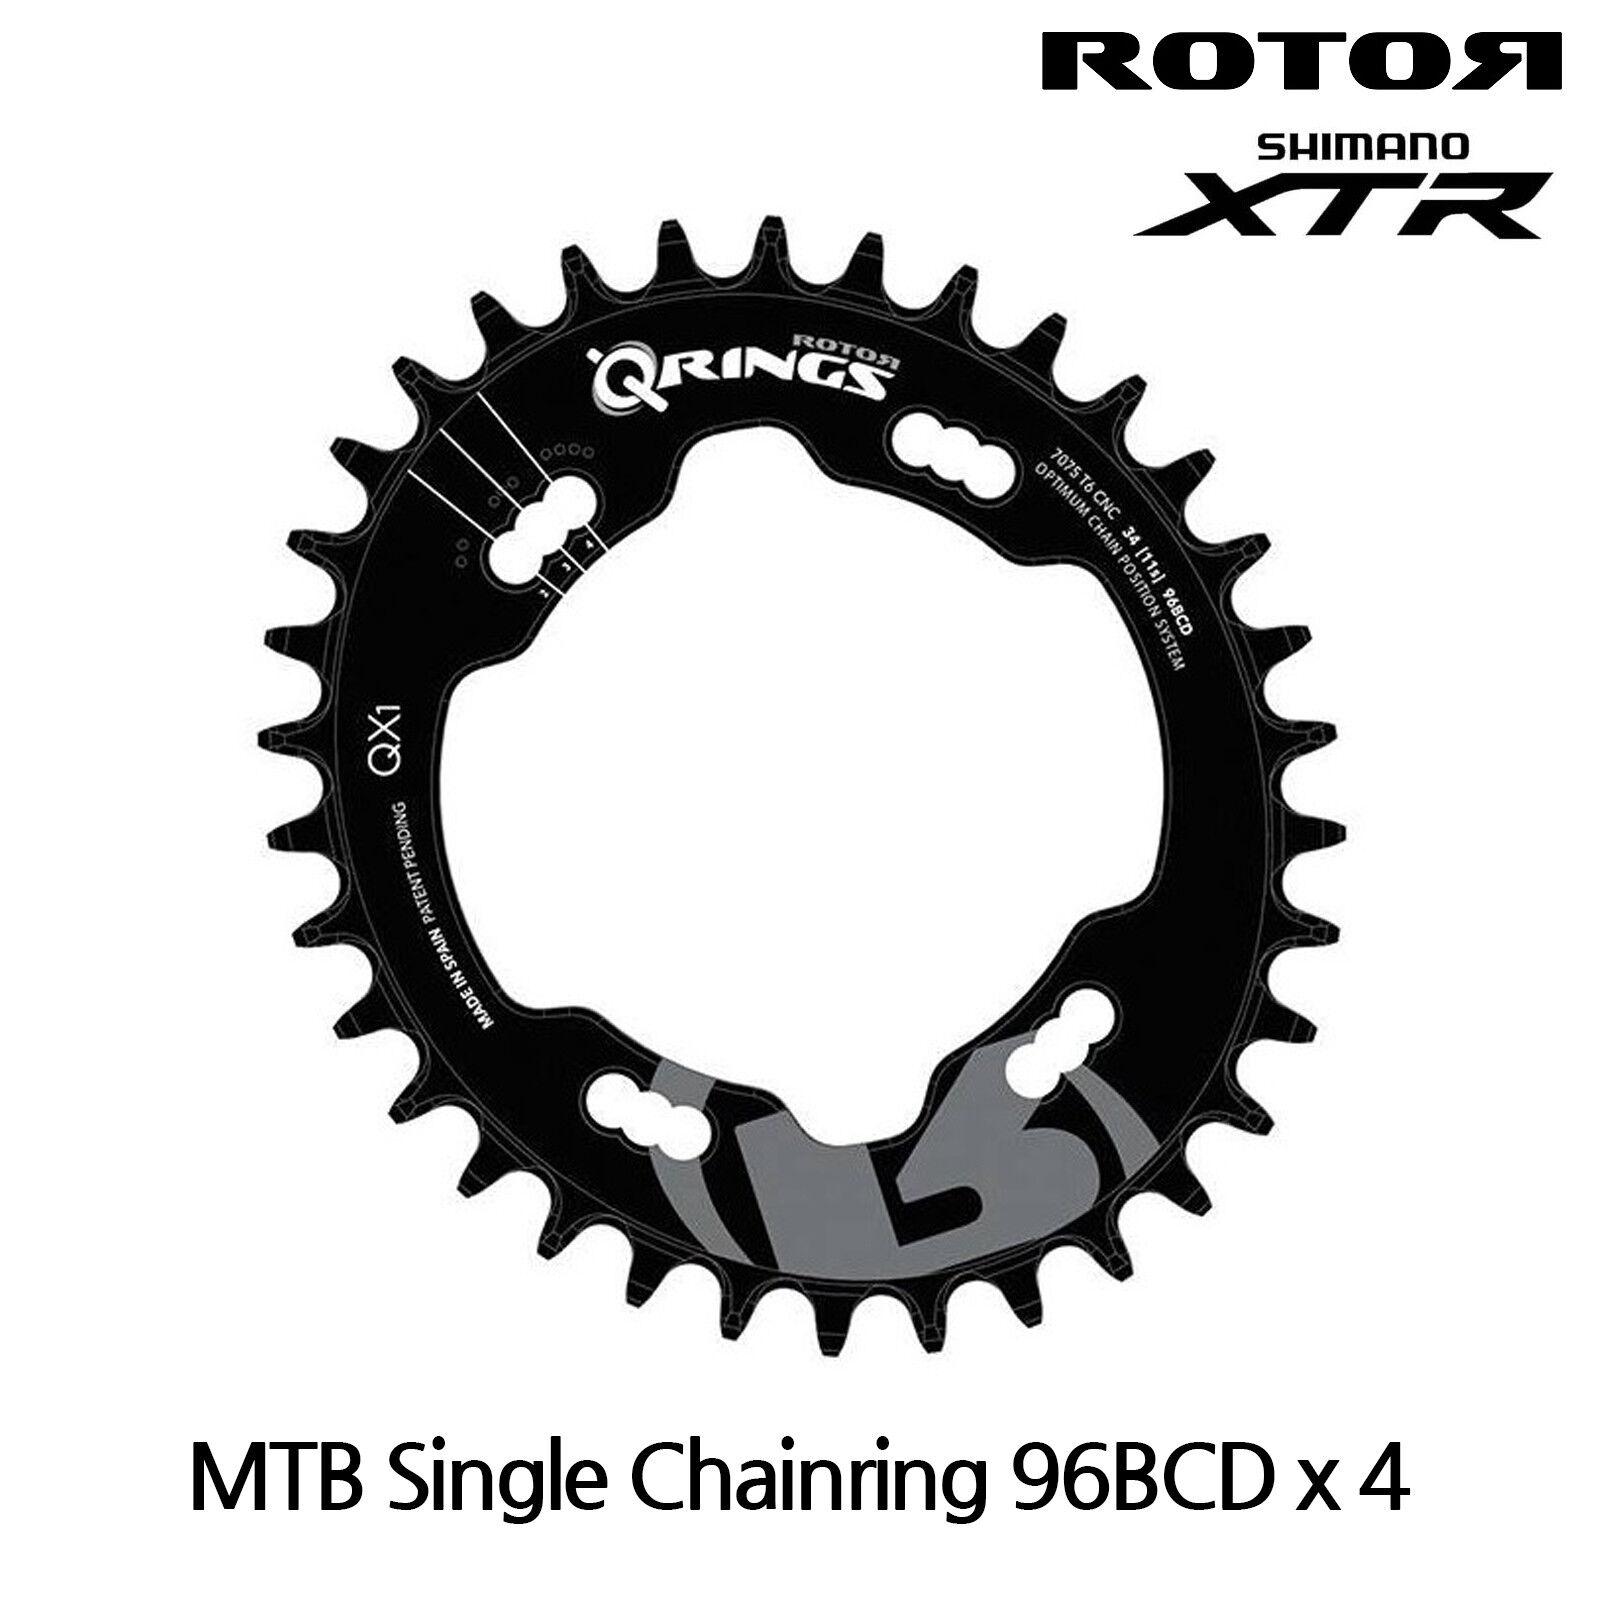 redOR MTB qrings Oval Single Chainrings QX1 Shimano XTR, 96BCD X 4 - 36T